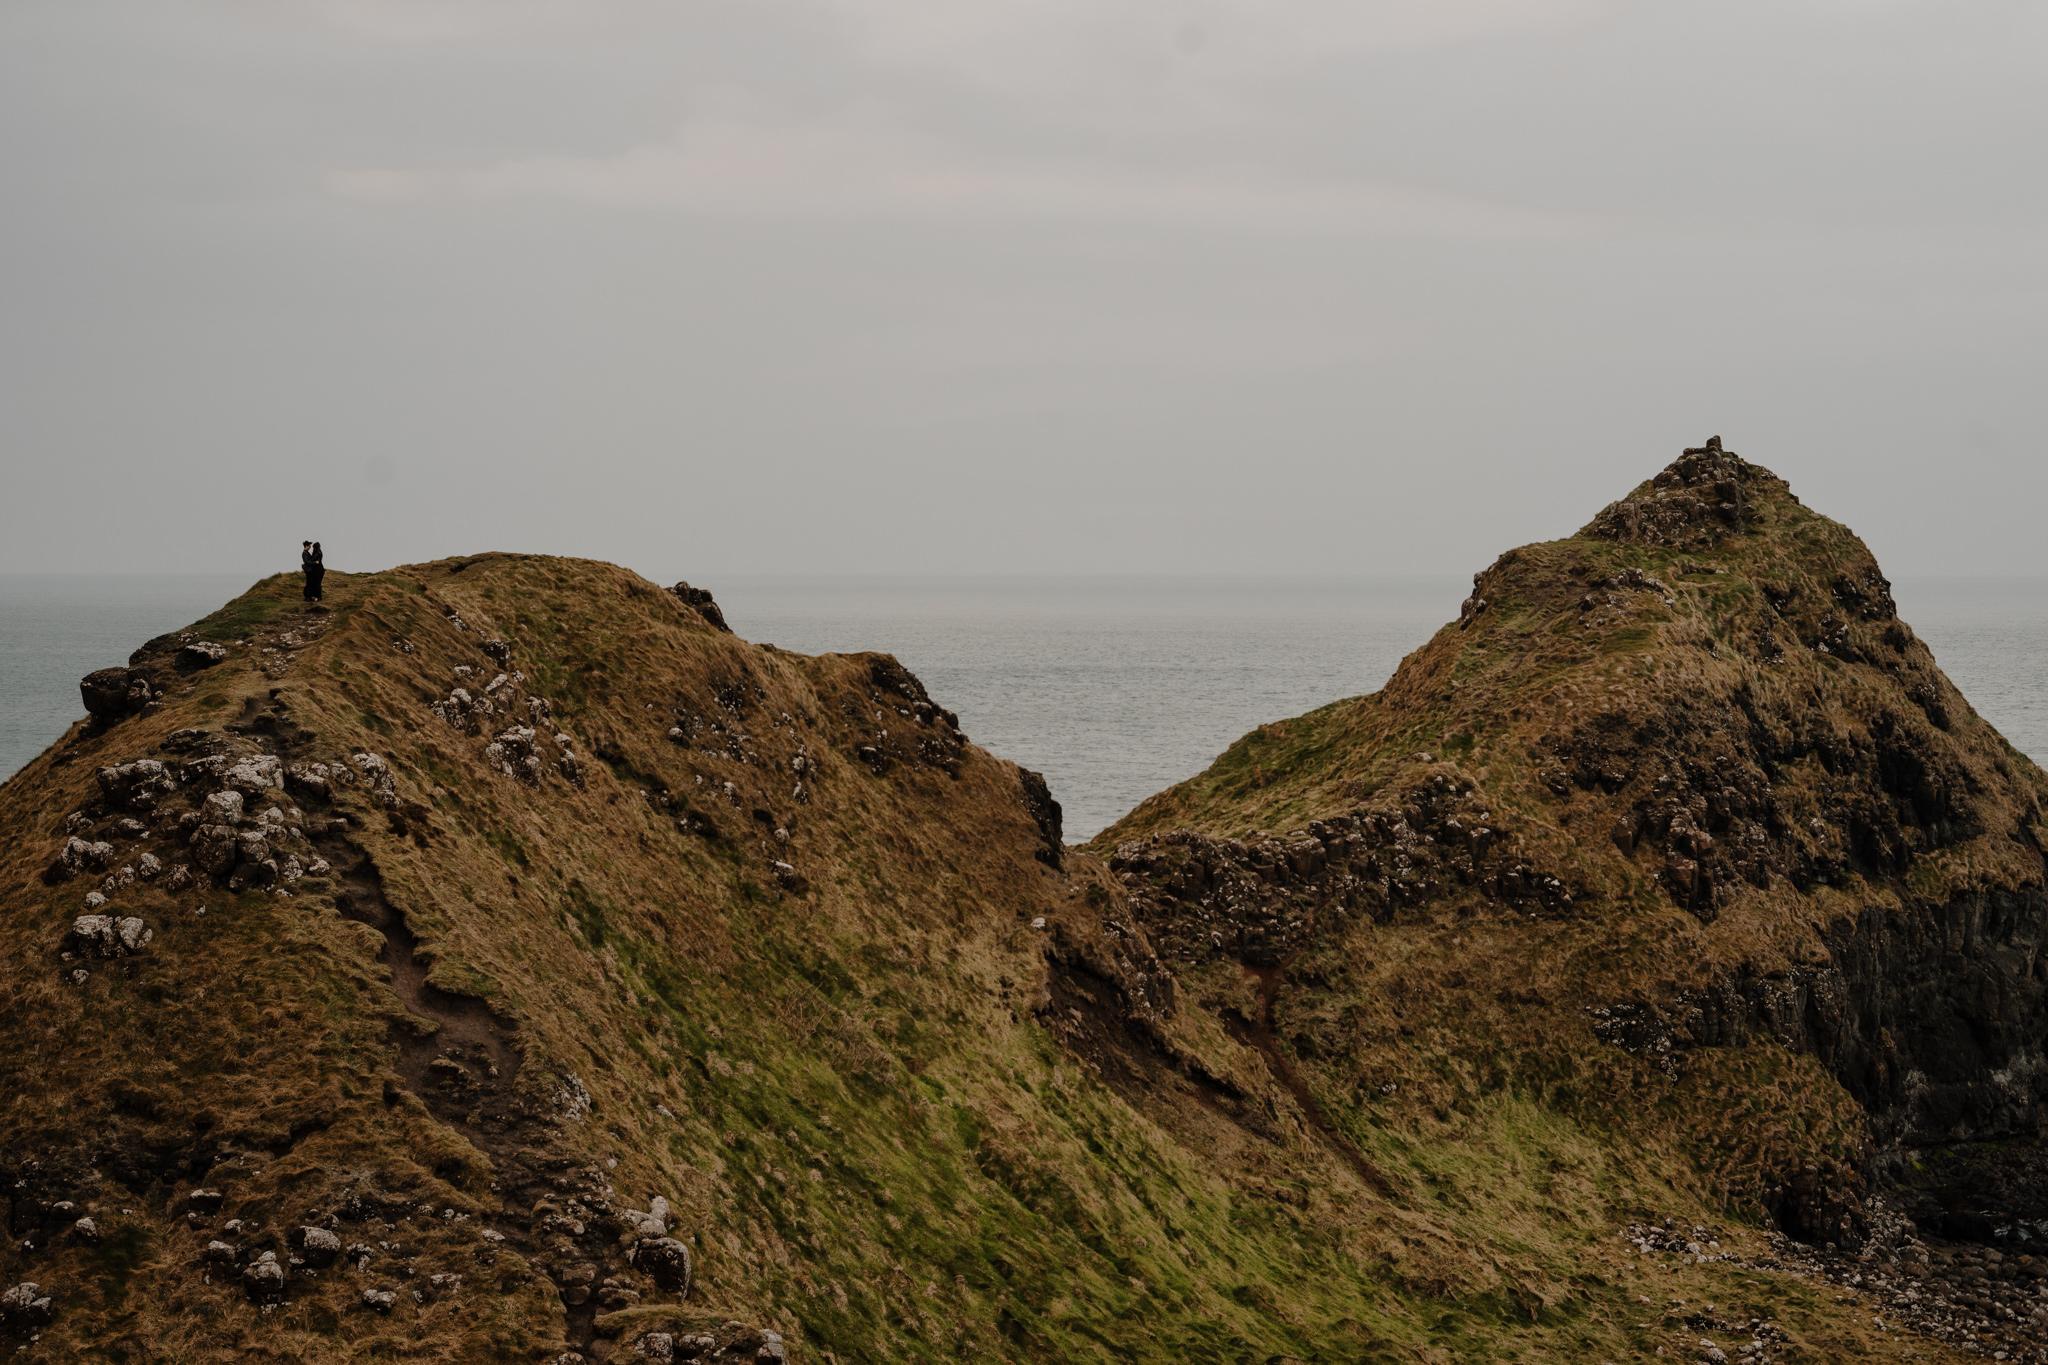 alternative elopement locations in Ireland The giants Causeway